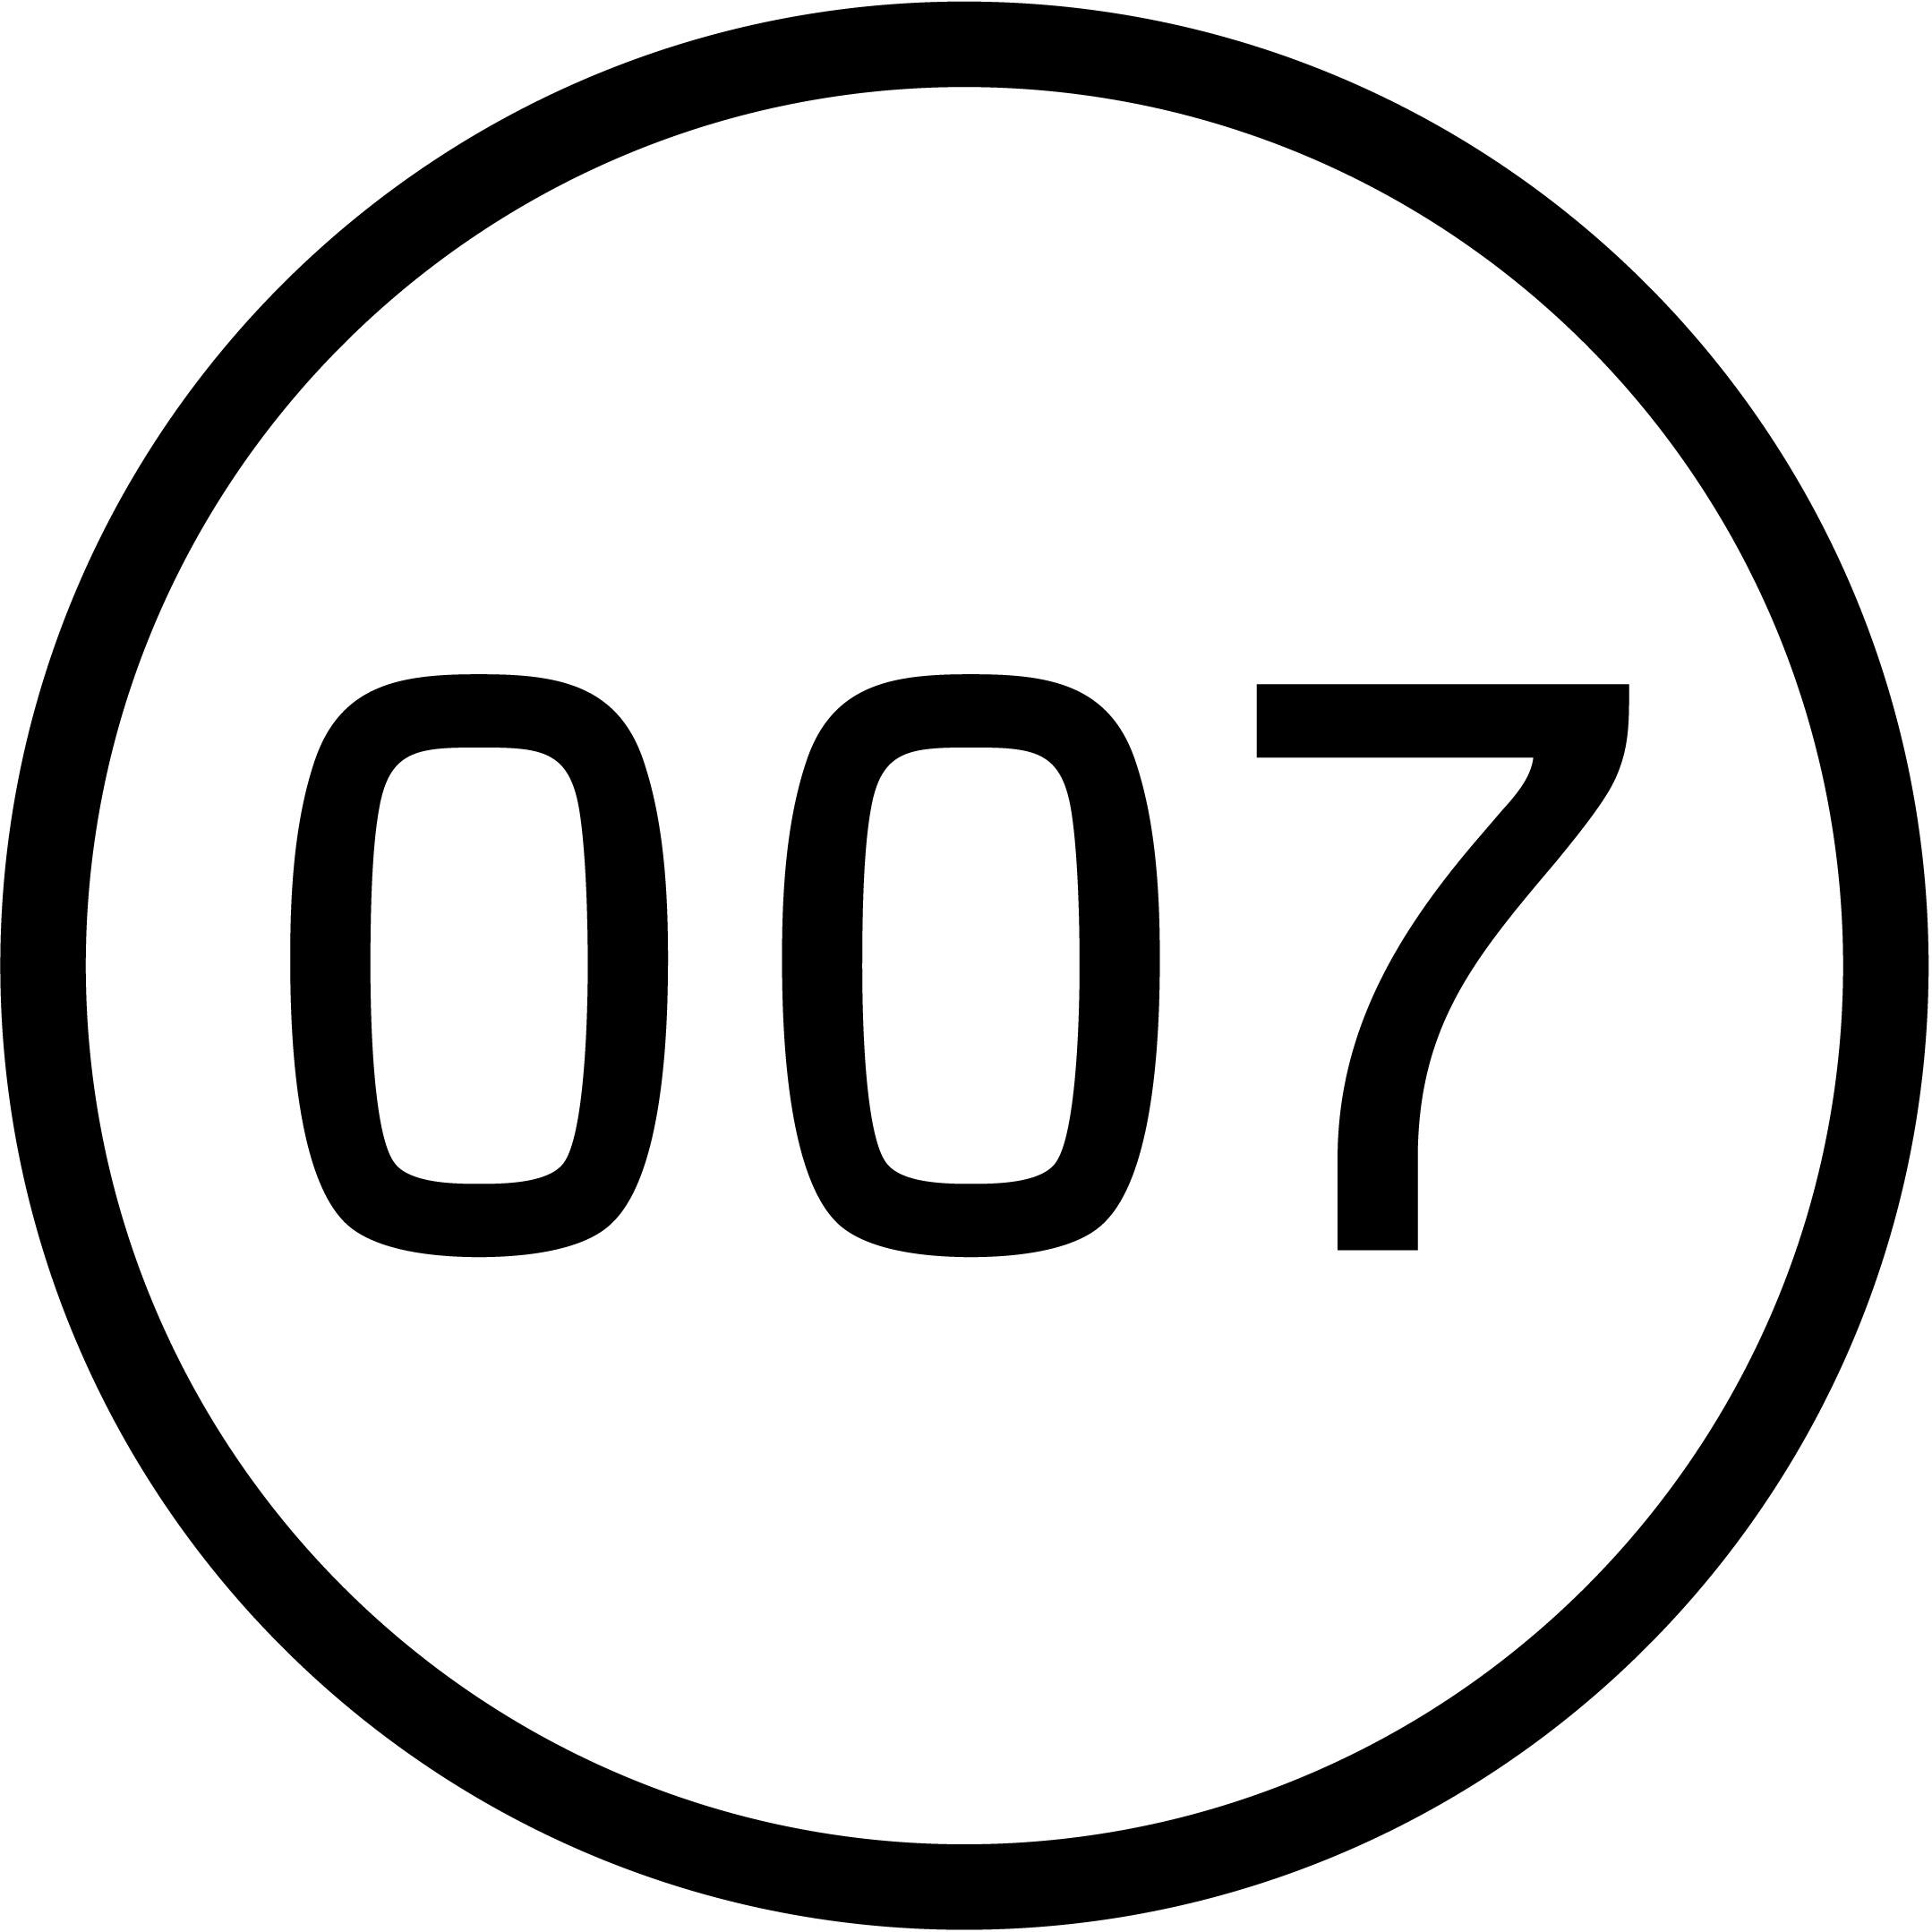 James Bond Goes Dynamite